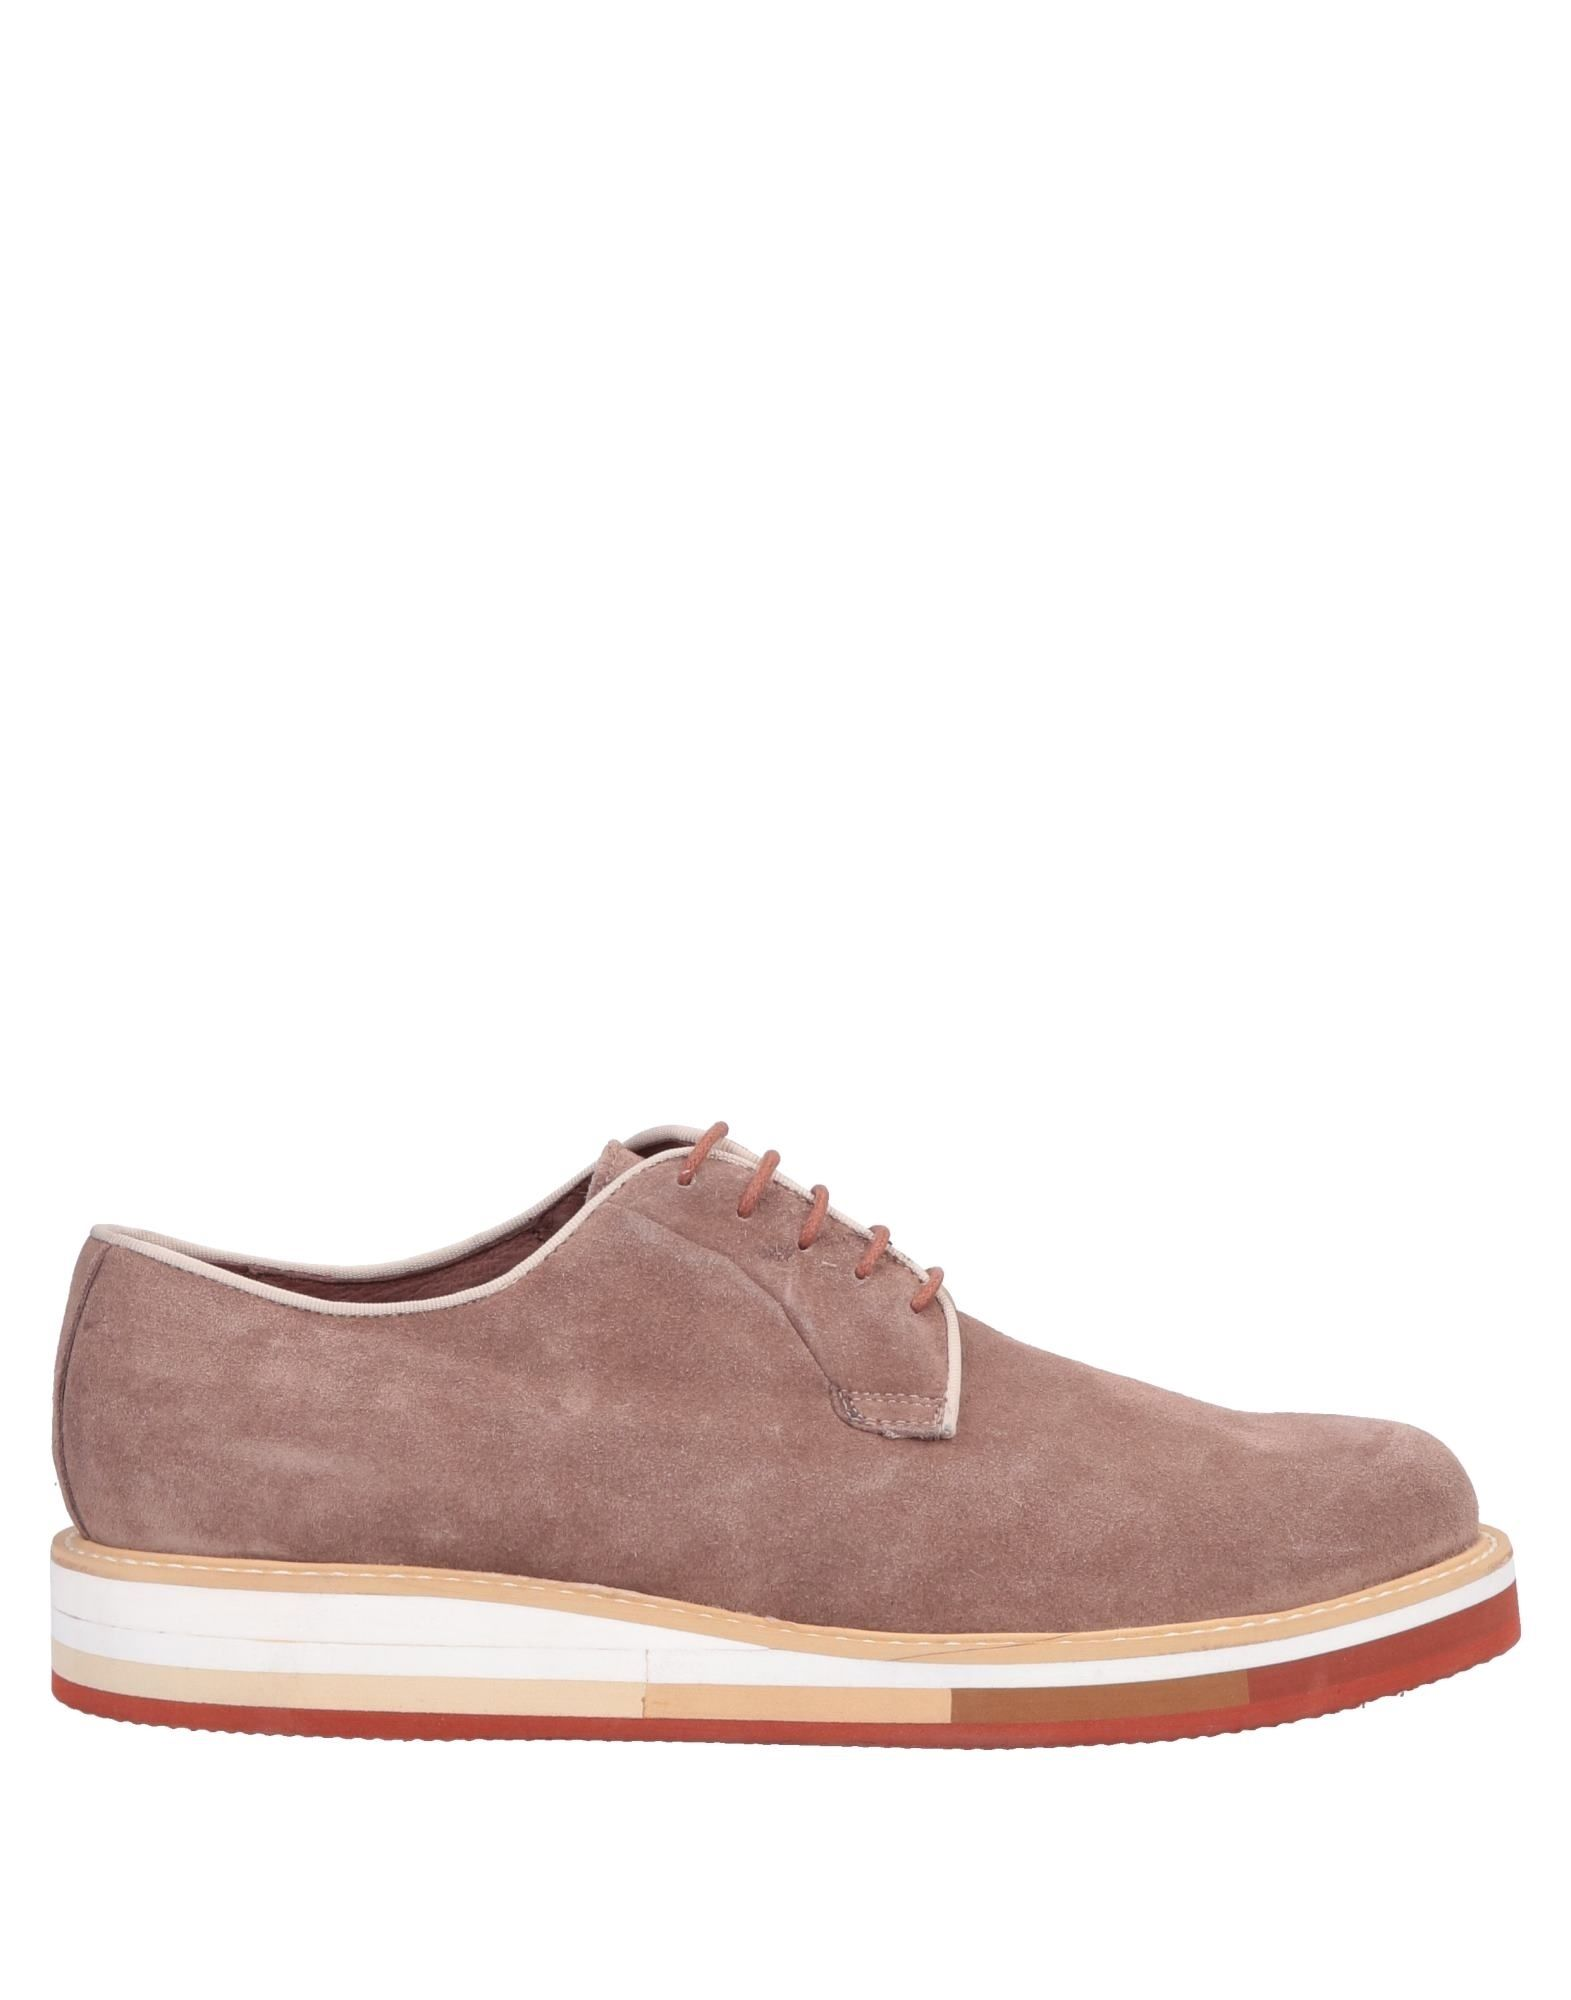 MA.TA MILANO FASHION Обувь на шнурках